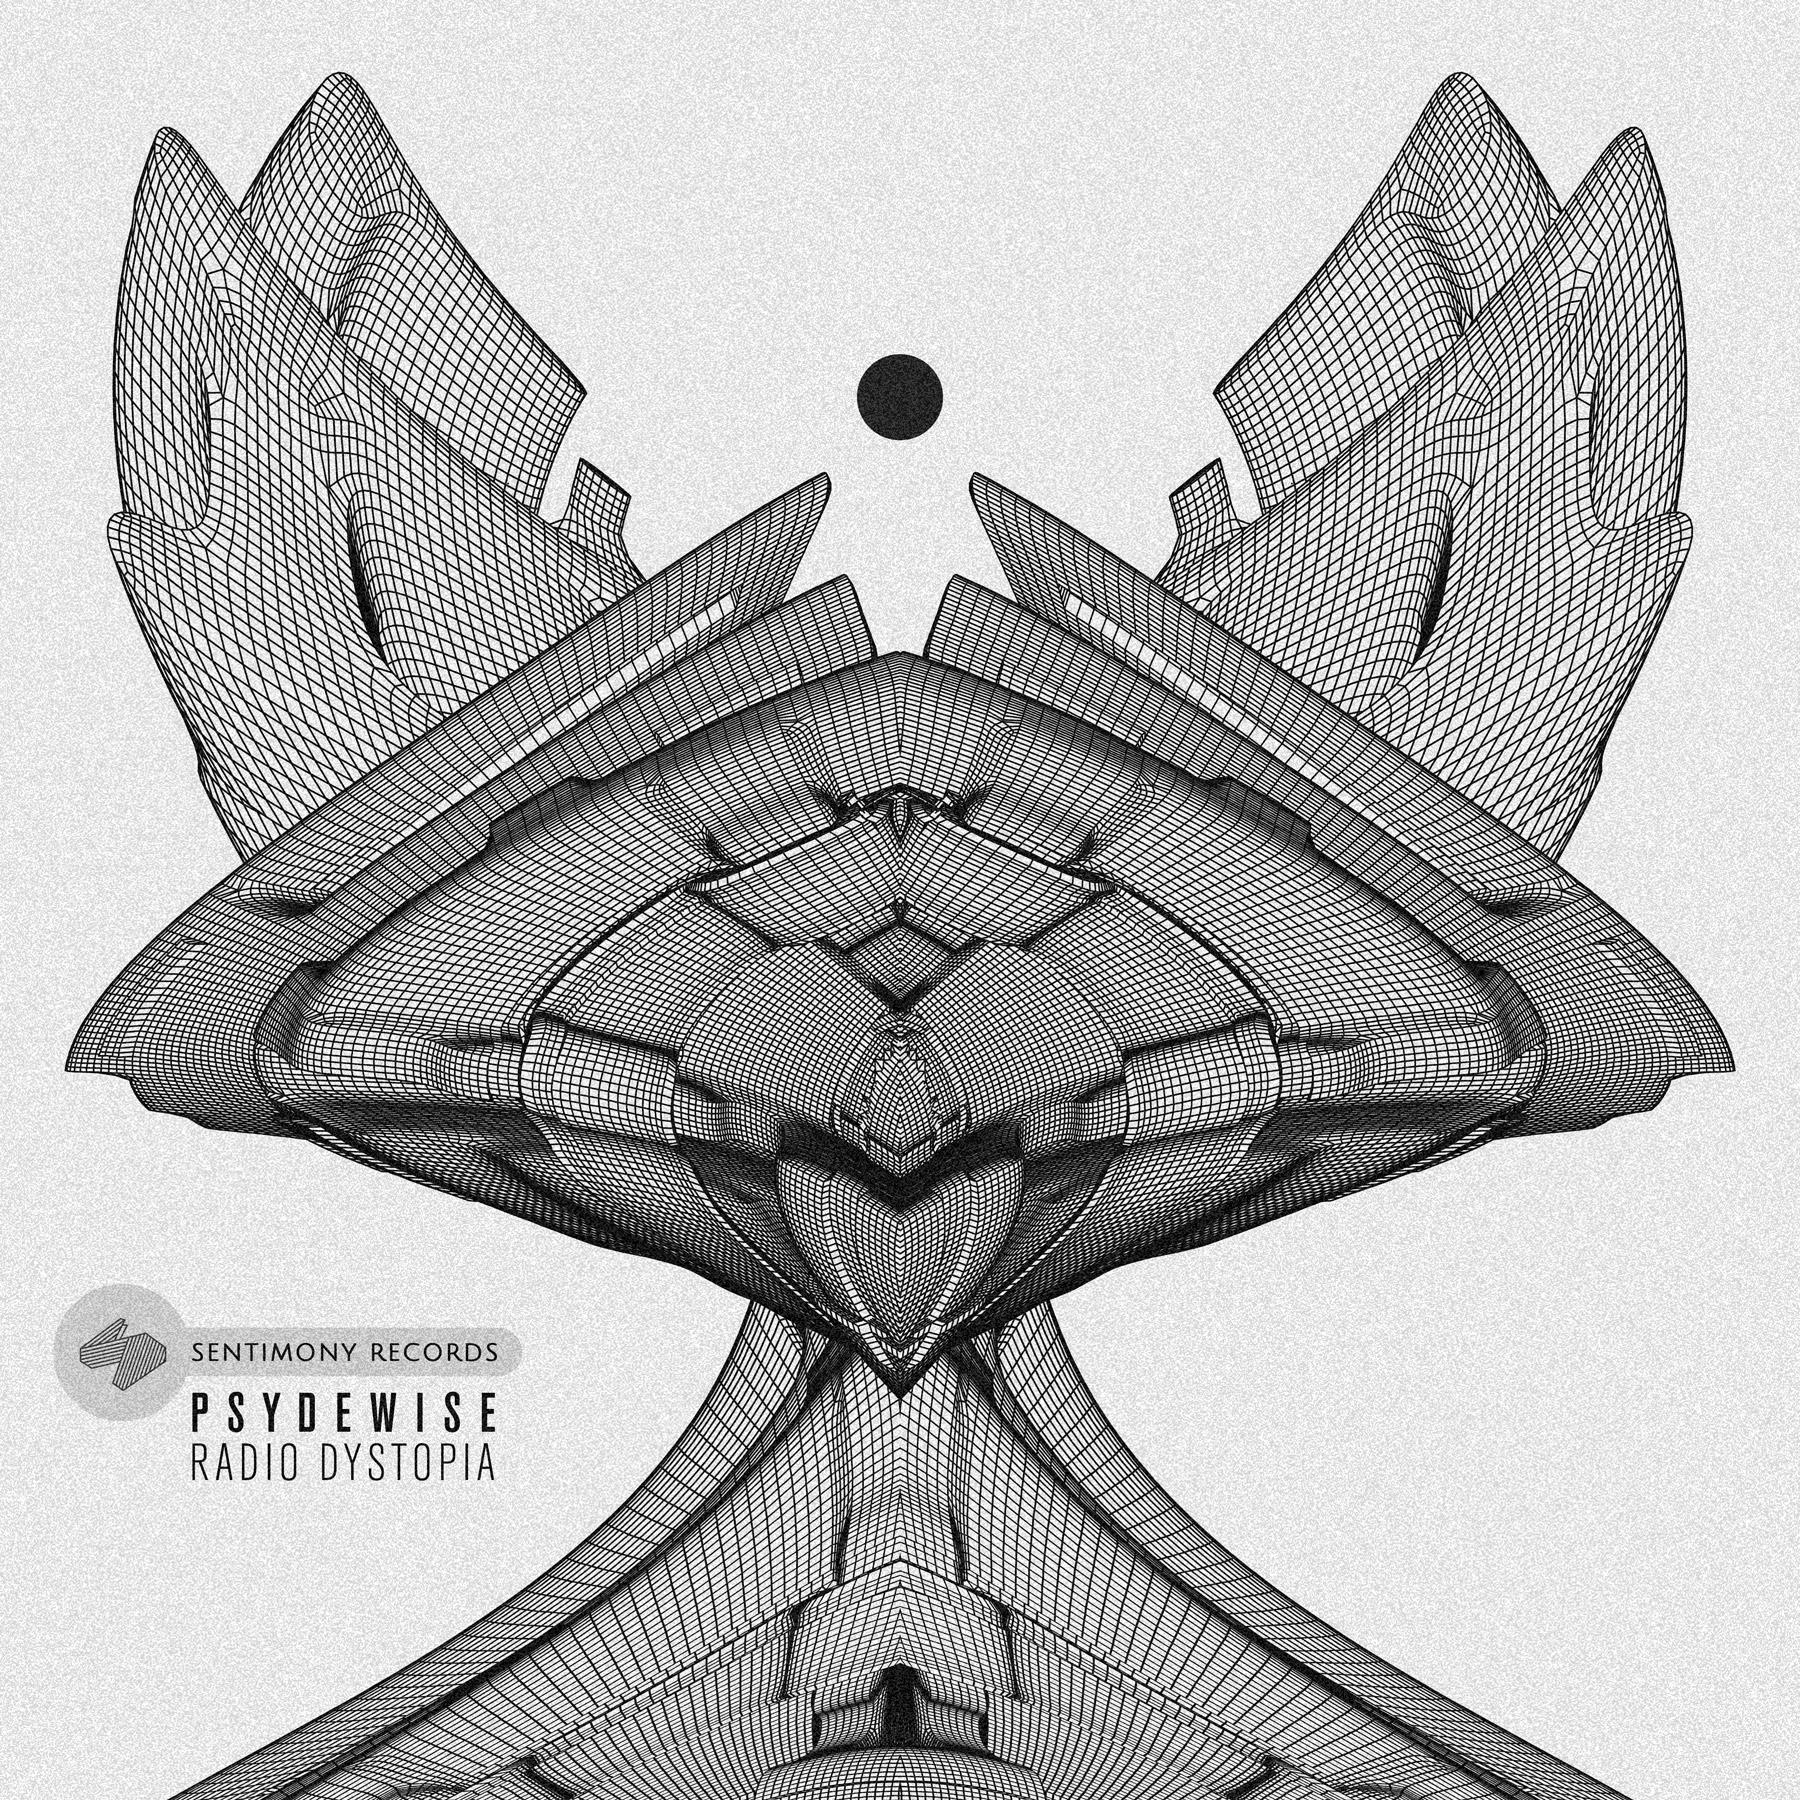 Psydewise «Radio Dystopia» EP